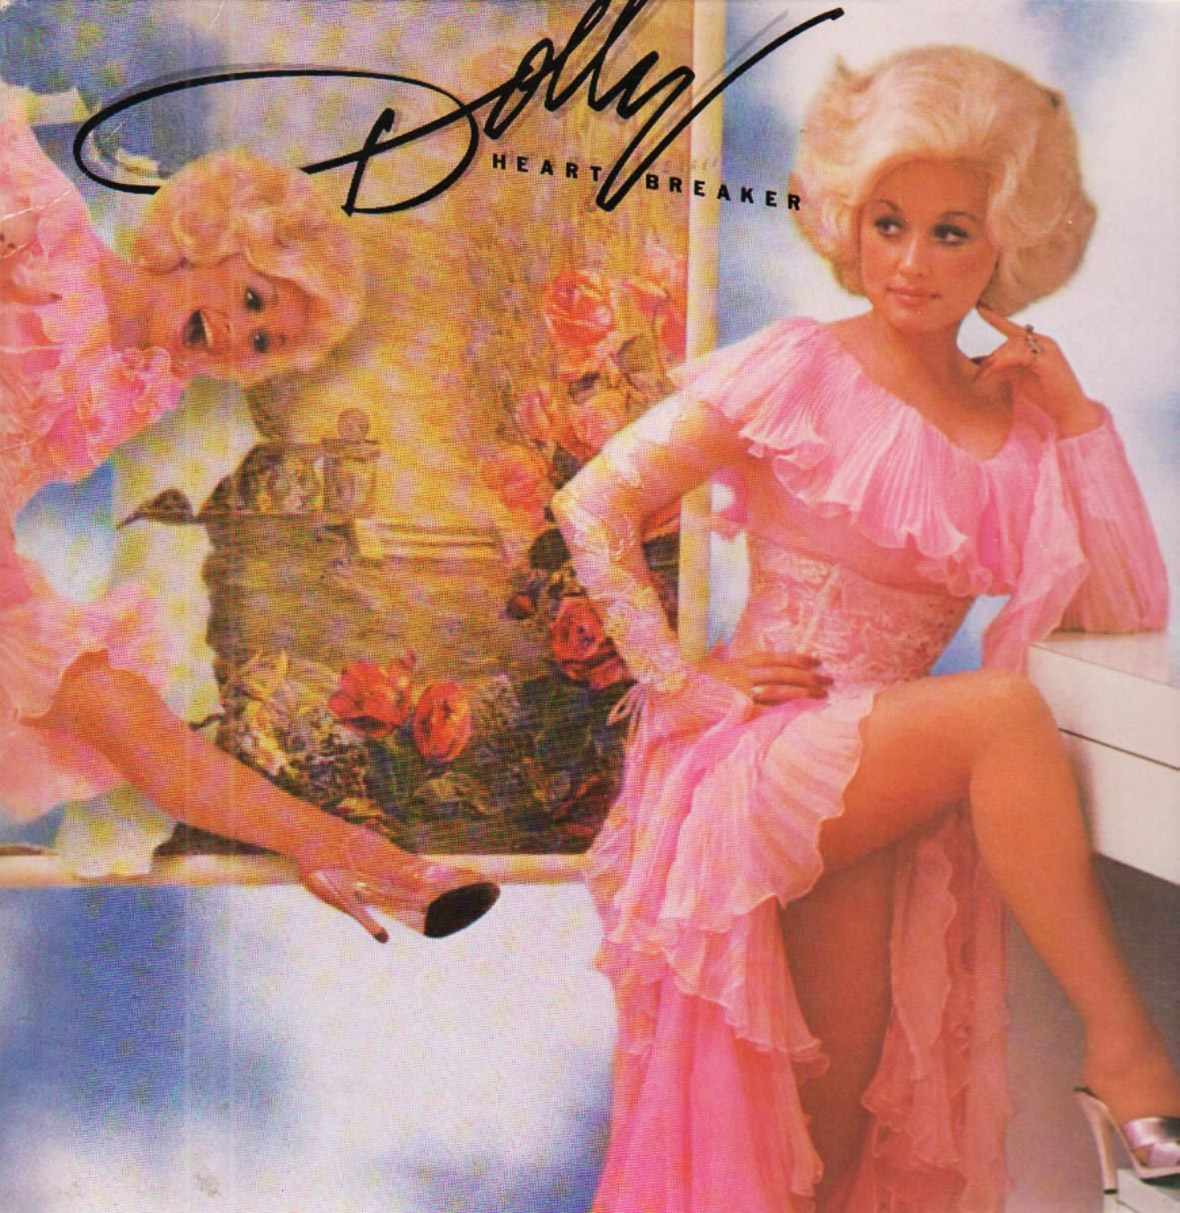 dolly parton turns 70